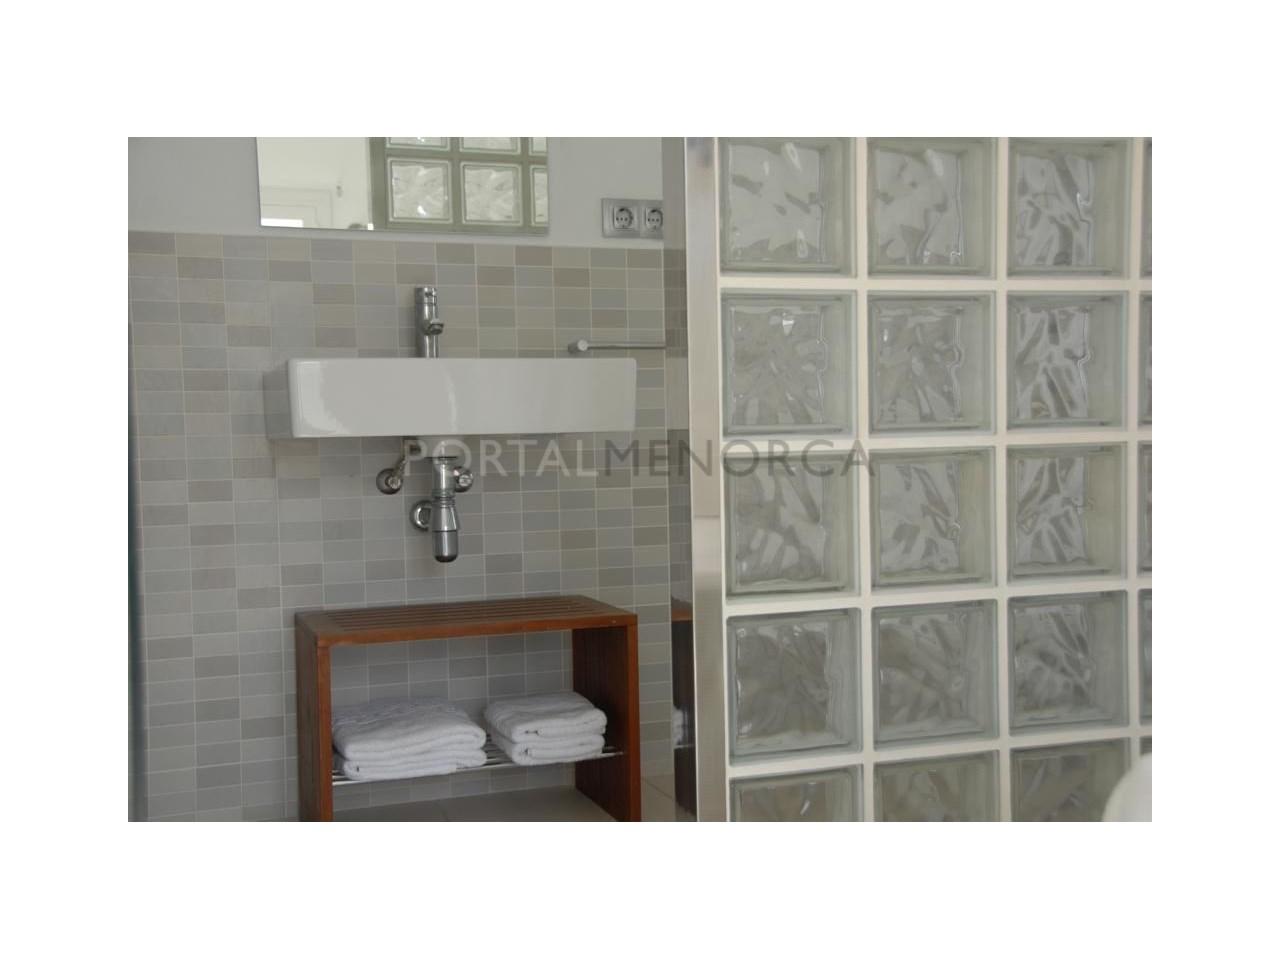 Modern apartment with sea views for sale in Cala Blanca Ciutadella Menorca-Bathroom